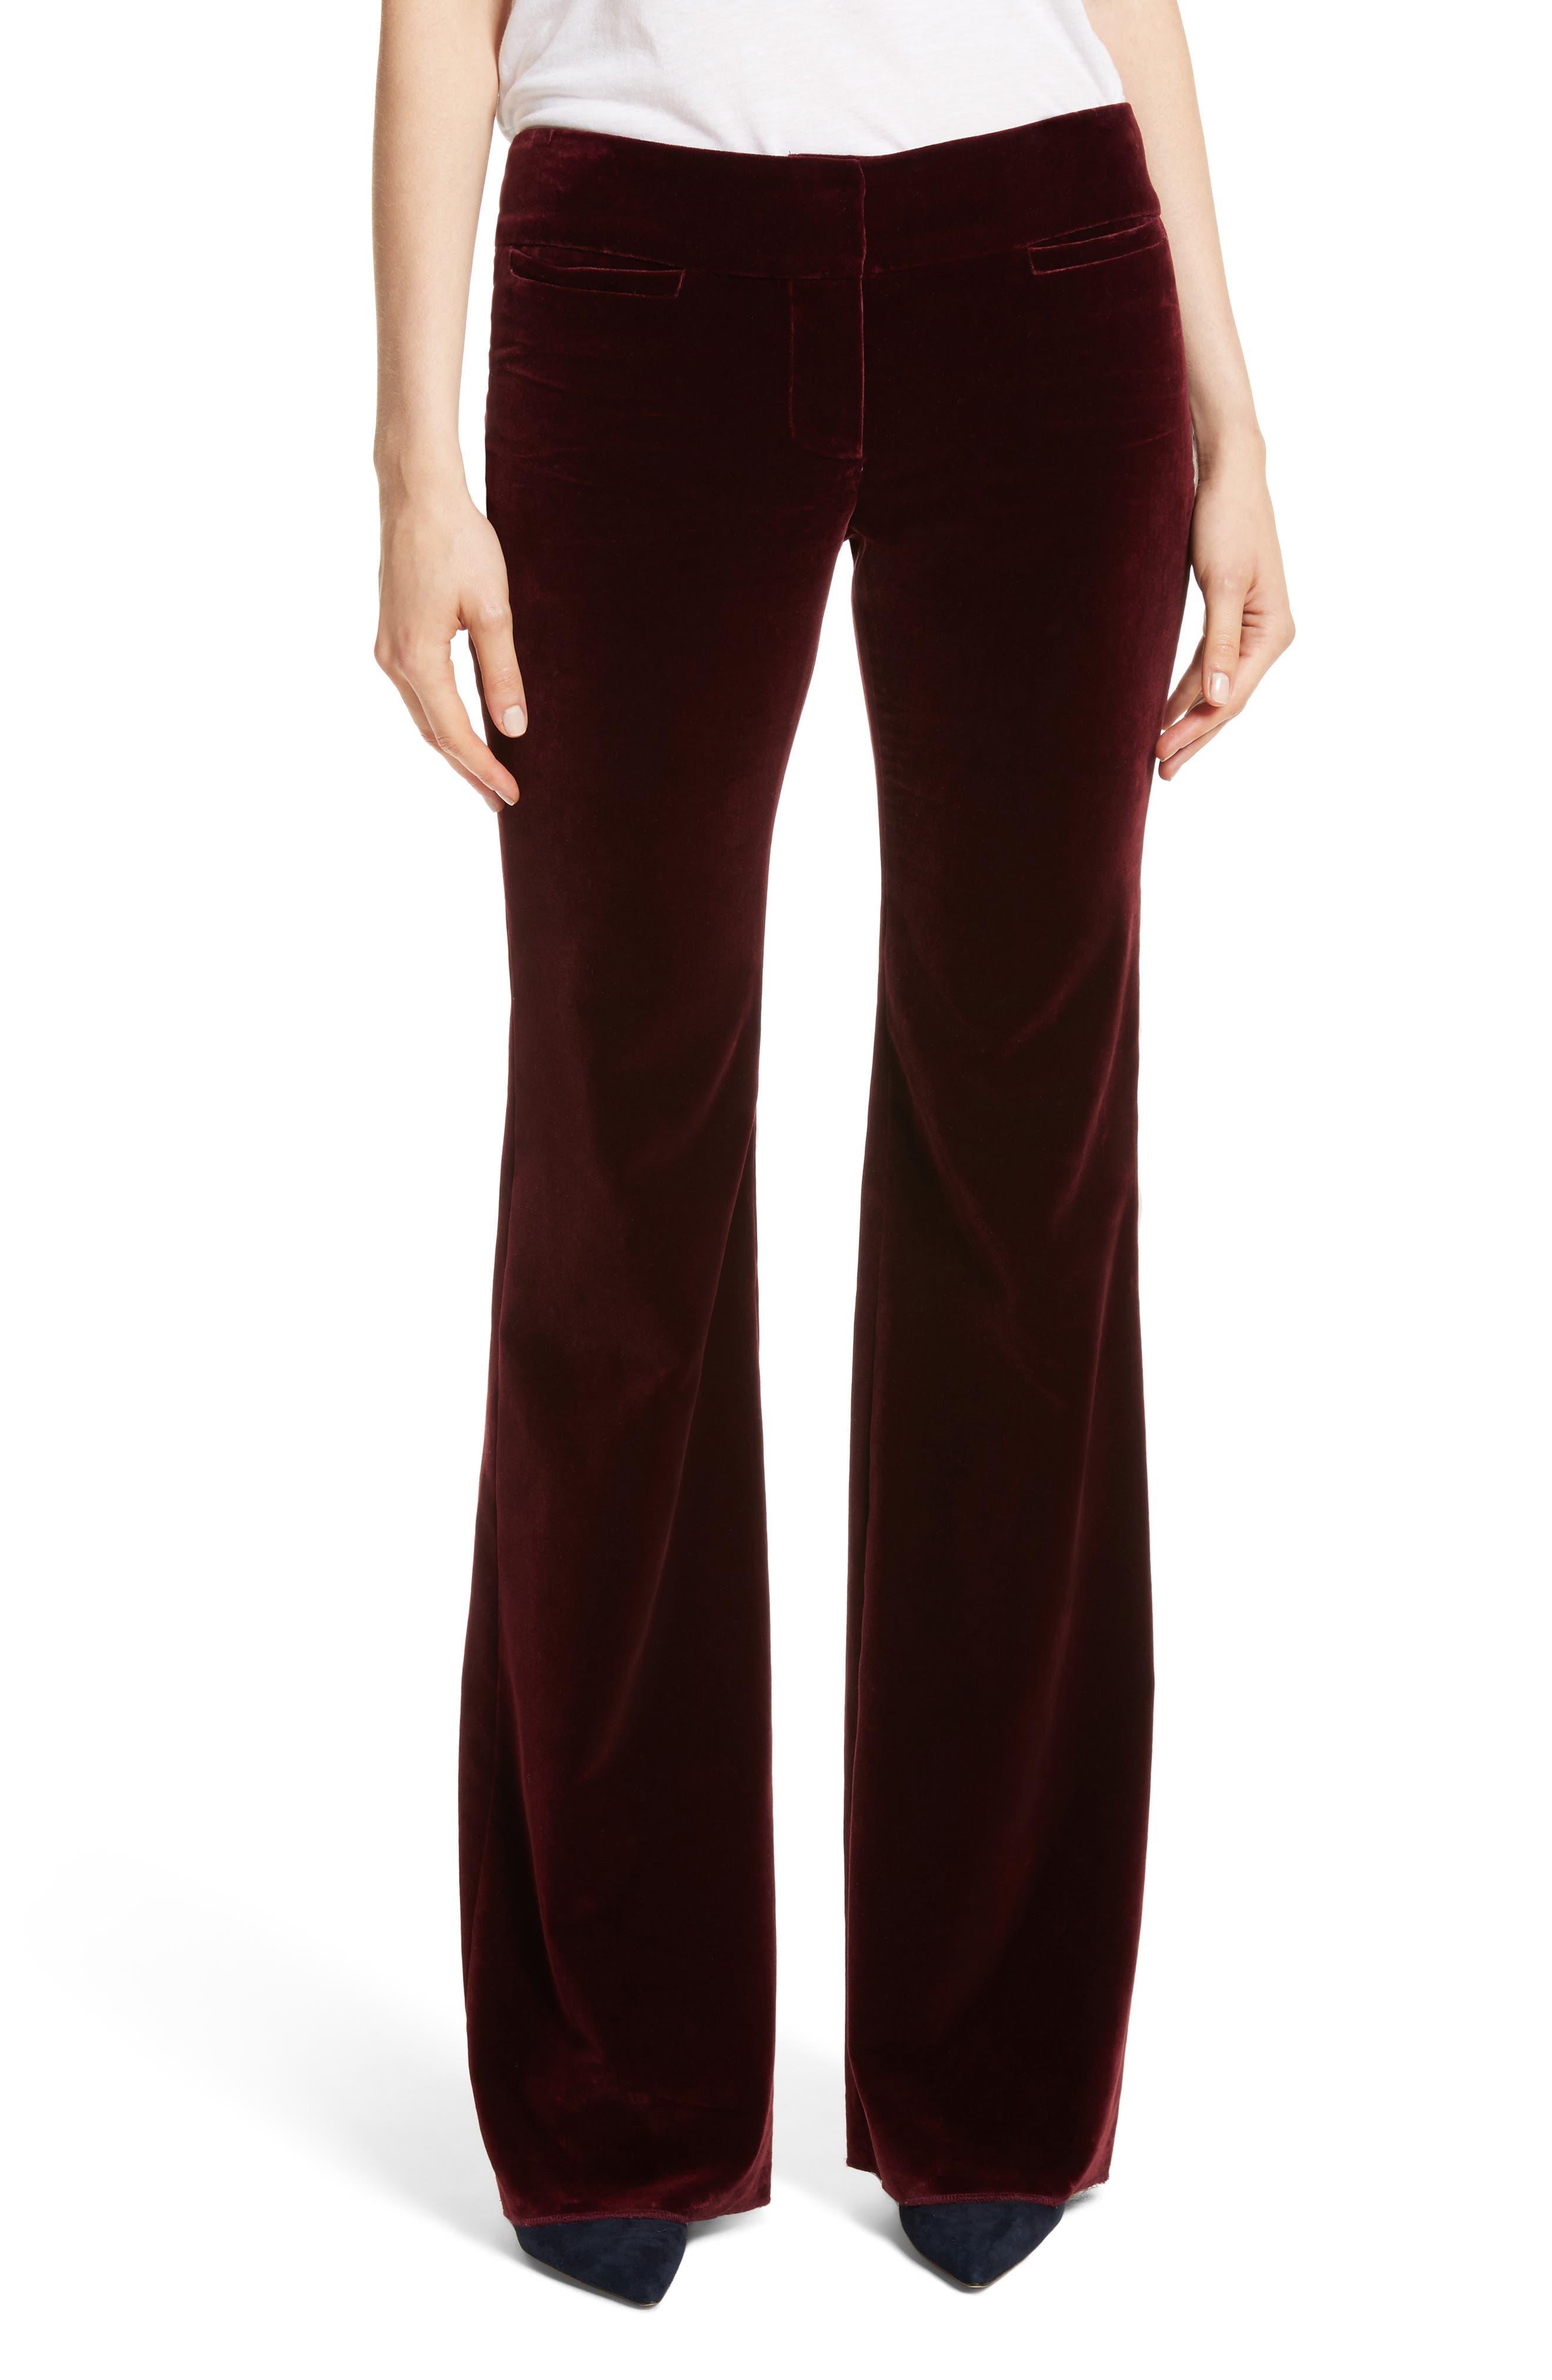 Alternate Image 1 Selected - Nili Lotan Amoire Velvet Flare Pants